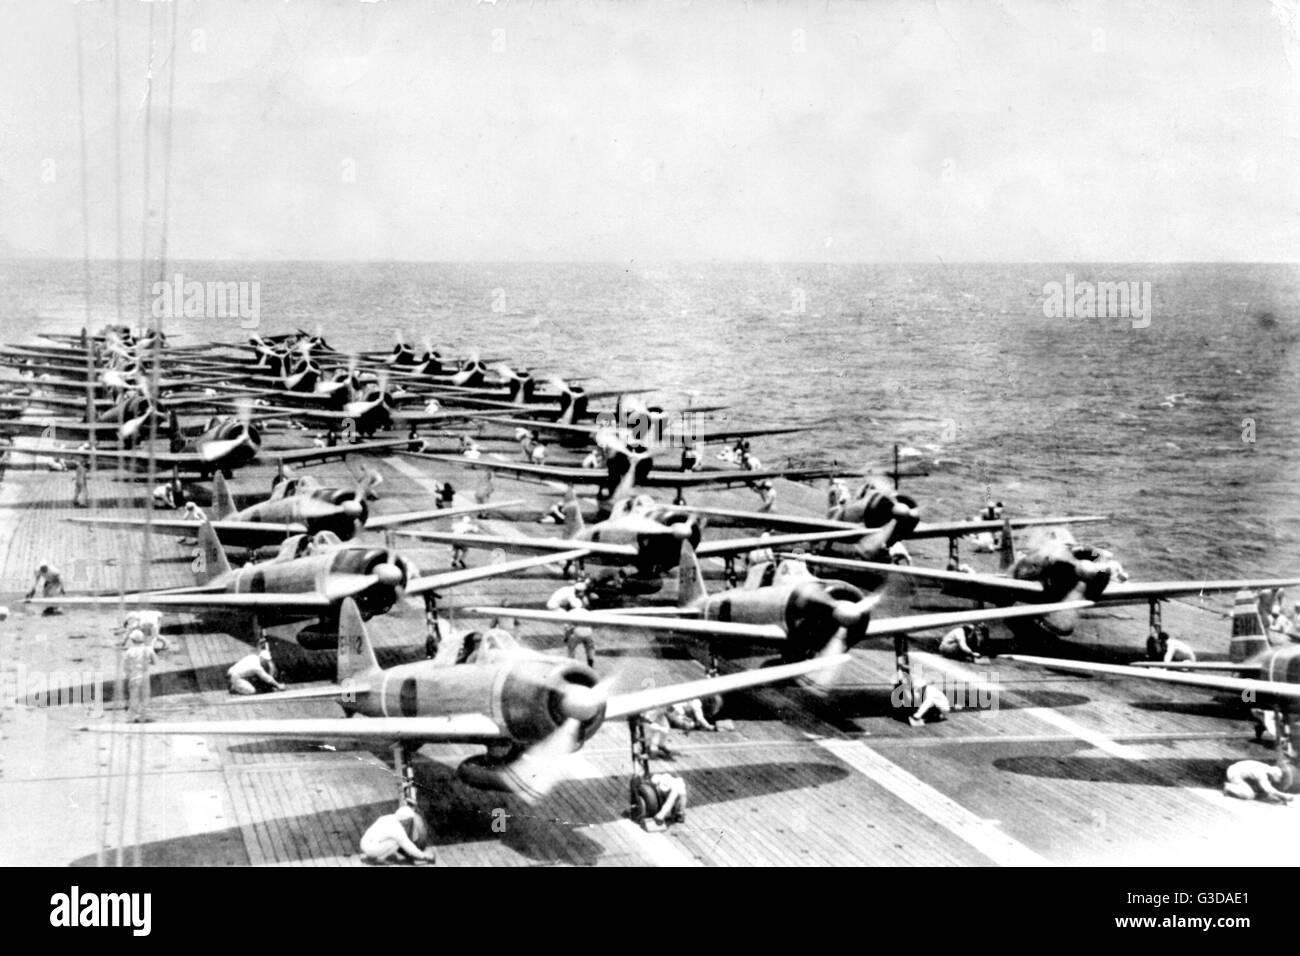 Japanese Aircraft Carrier Stock Photos & Japanese Aircraft